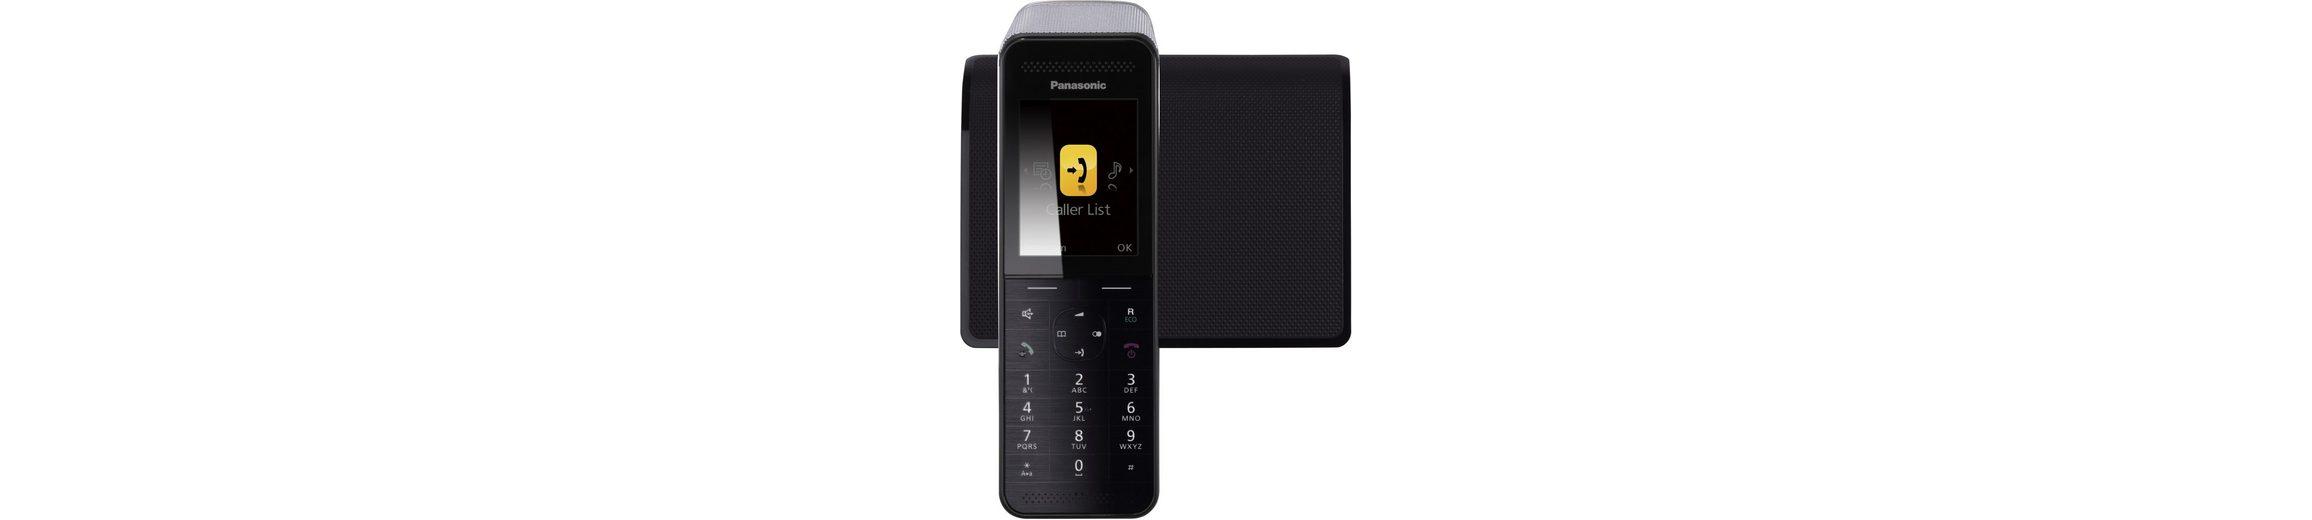 Panasonic KX-PRW120GW Schnurloses DECT Telefon mit AB